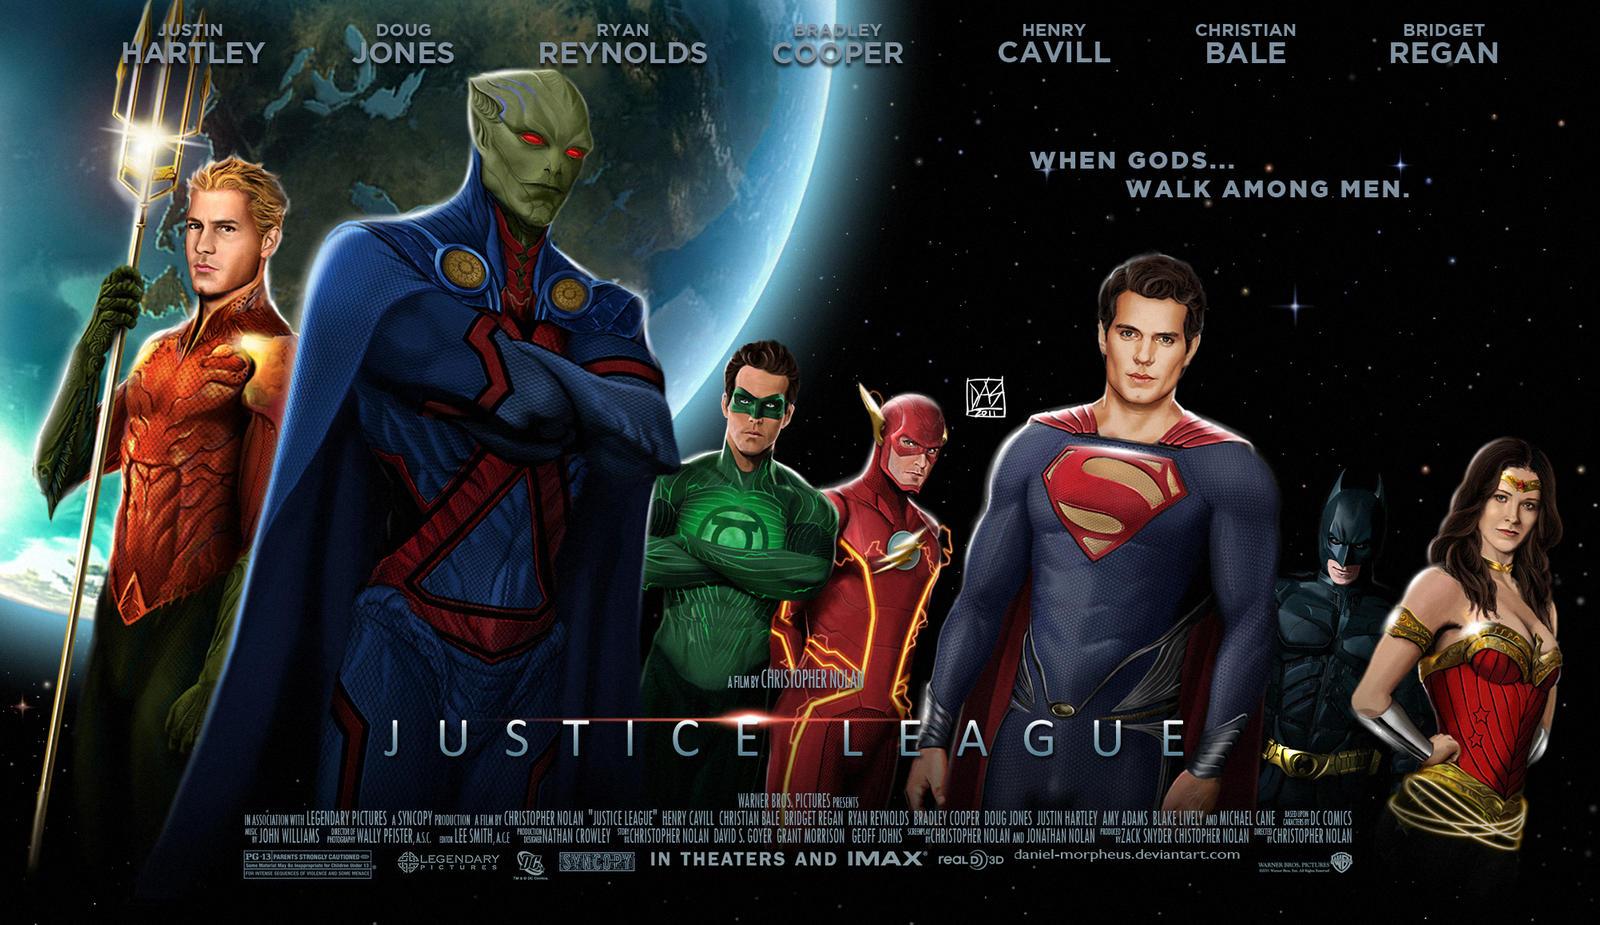 Batman Vs Justice League Movie